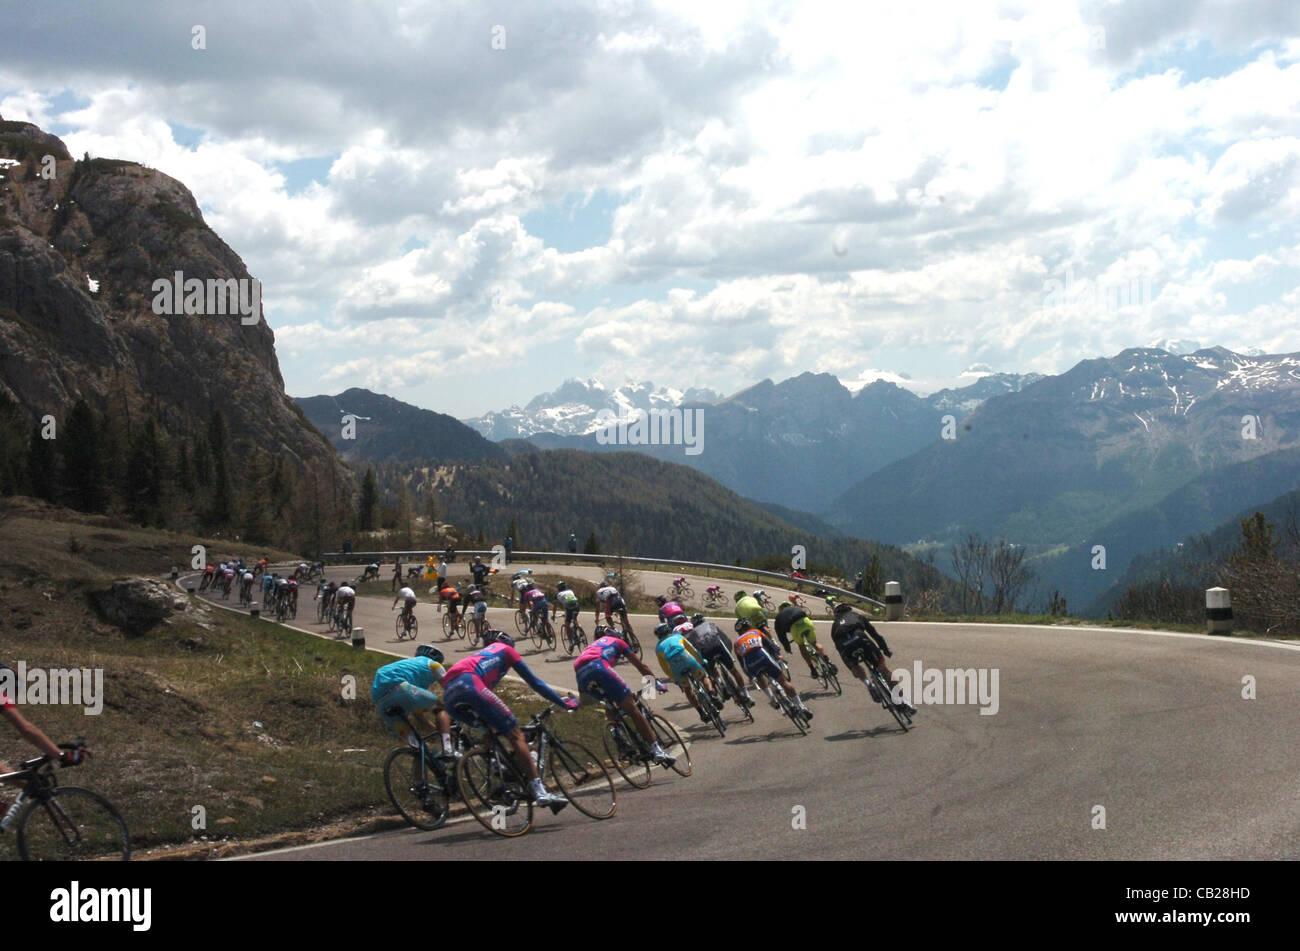 Giro D'italia Stock Photos & Giro D'italia Stock Images ...